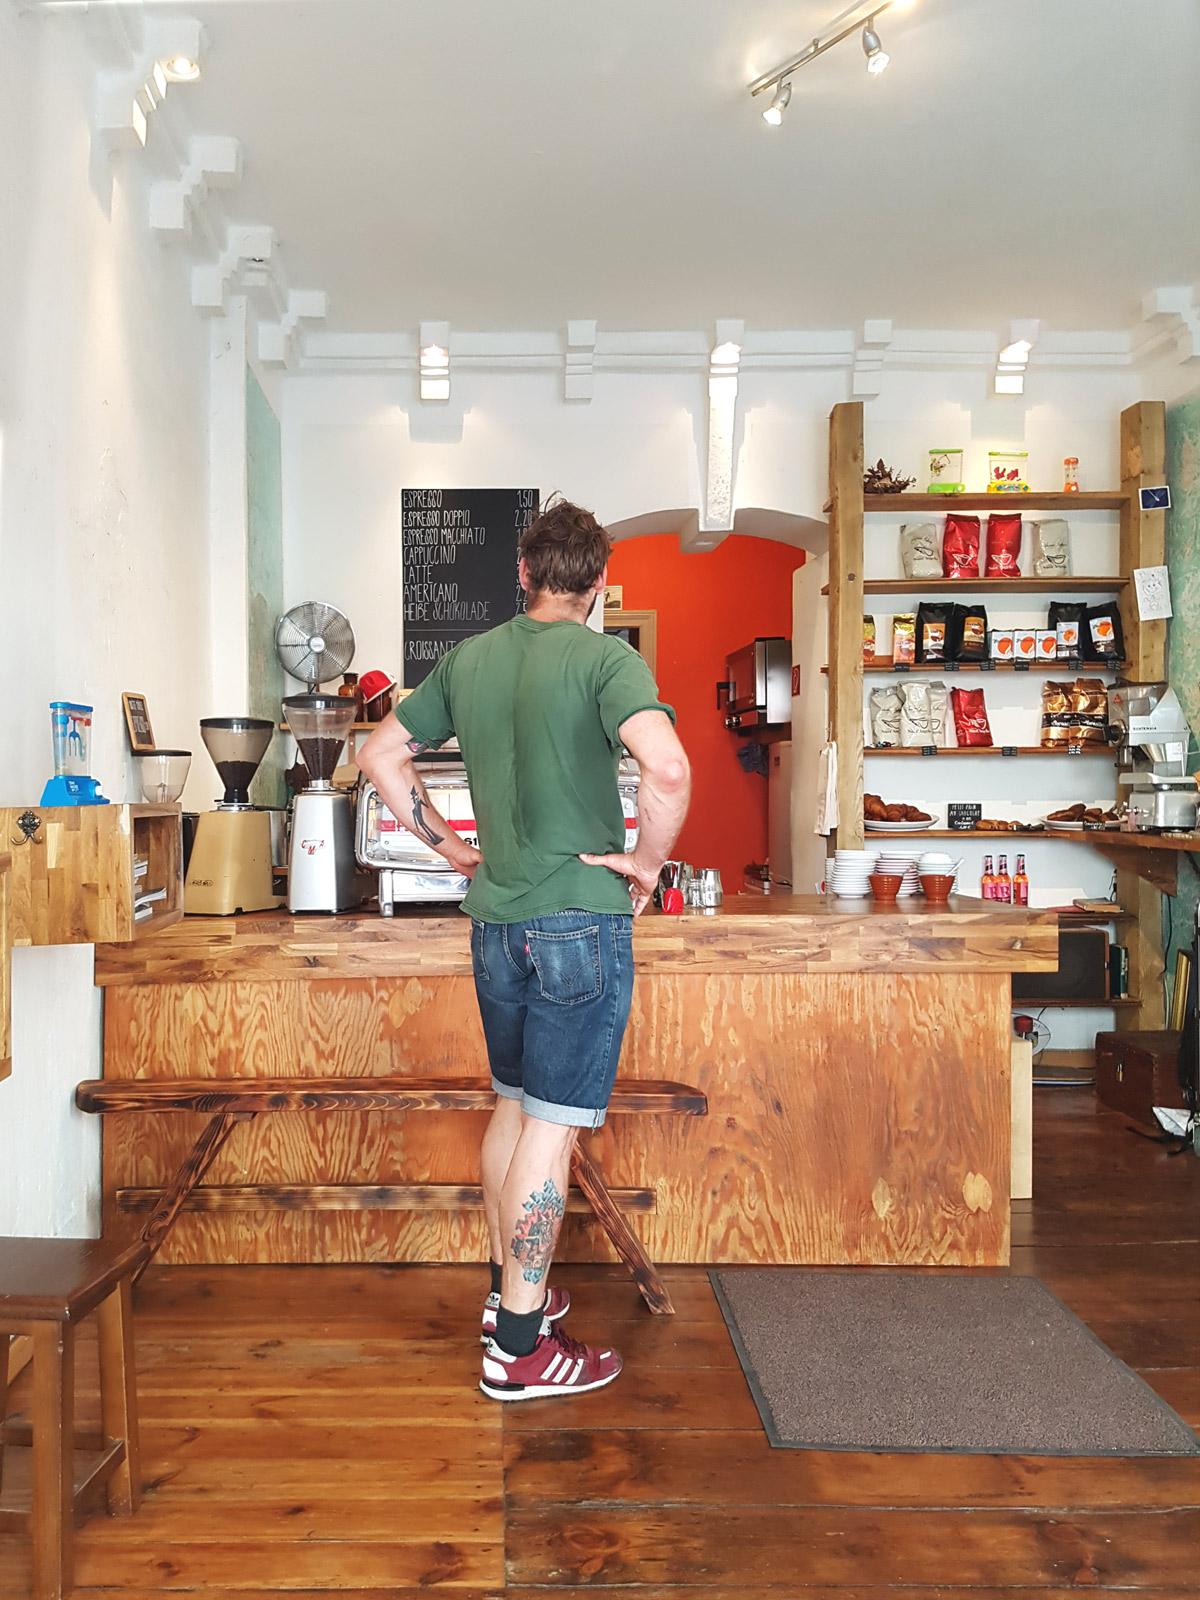 Mi Onda Cafe in Berlin